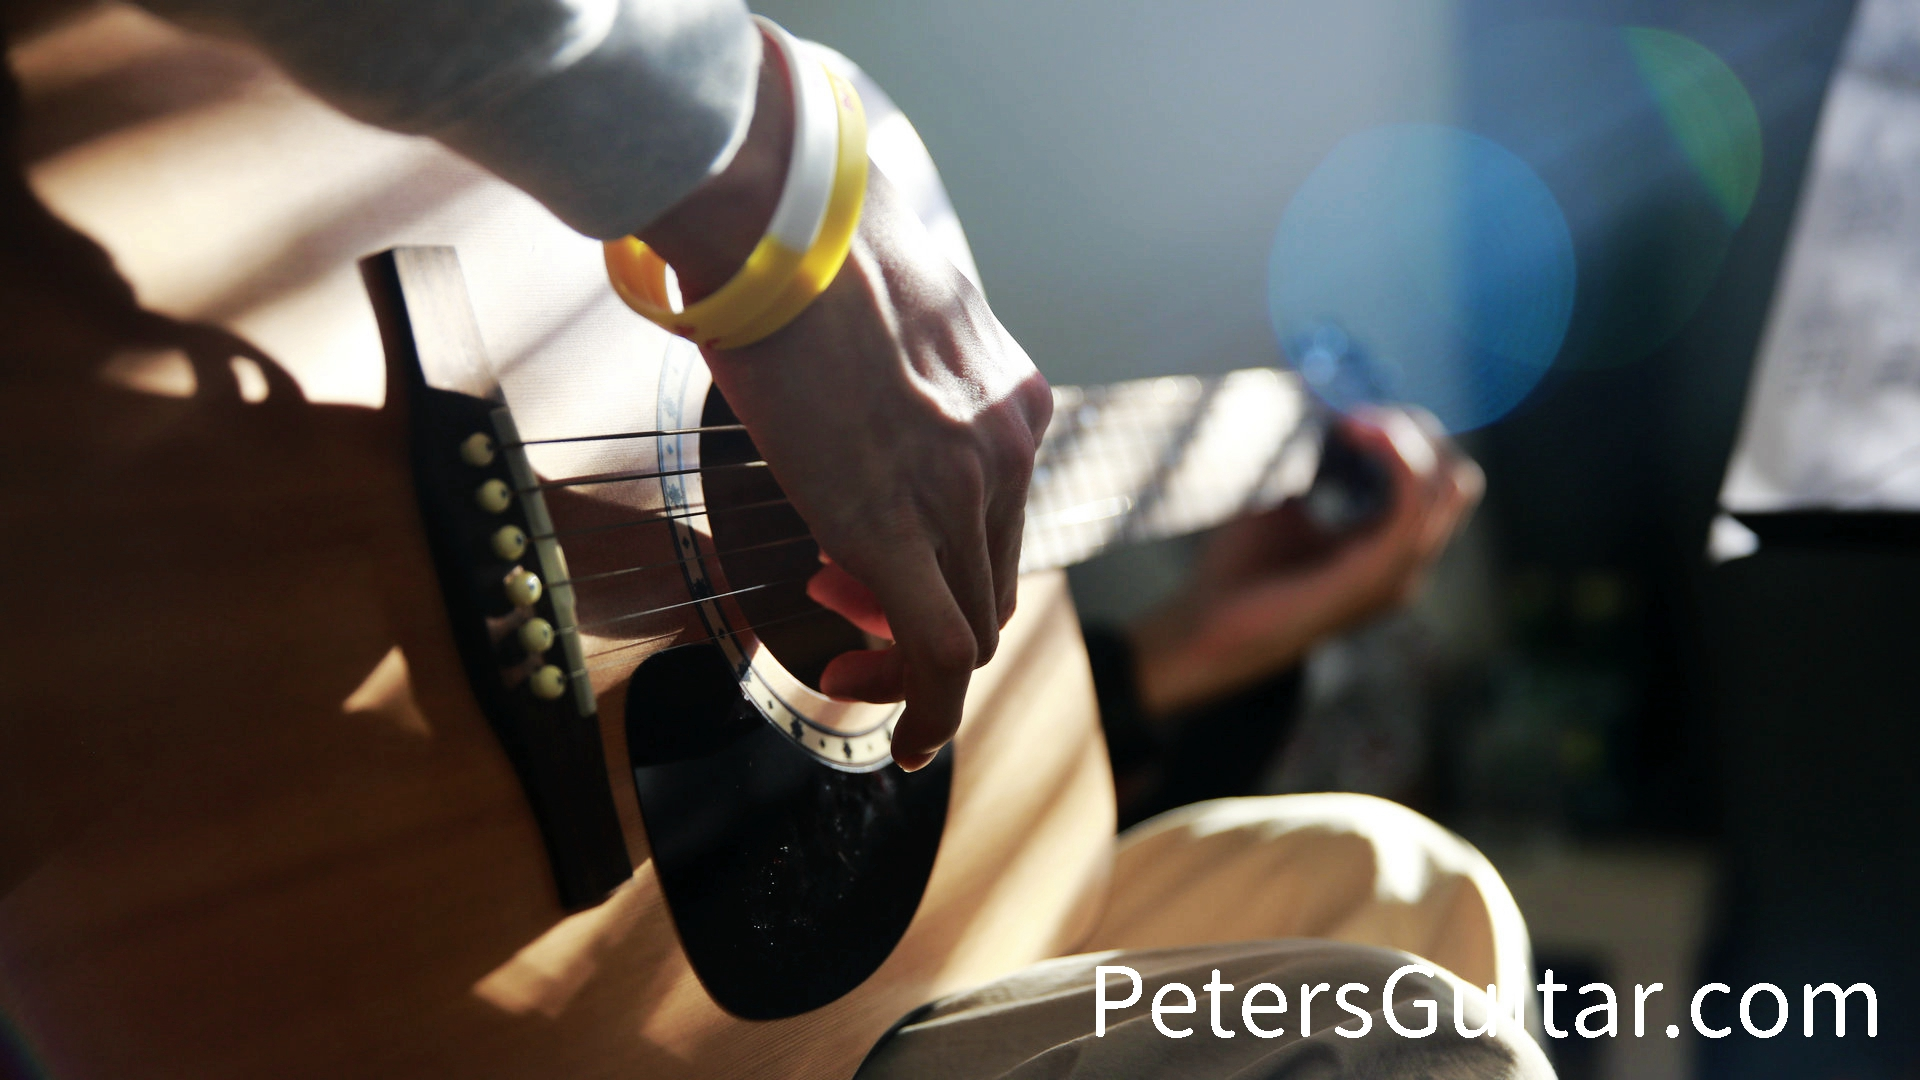 PetersGuitar_com 功夫吉他 温哥华吉他老师11.jpg